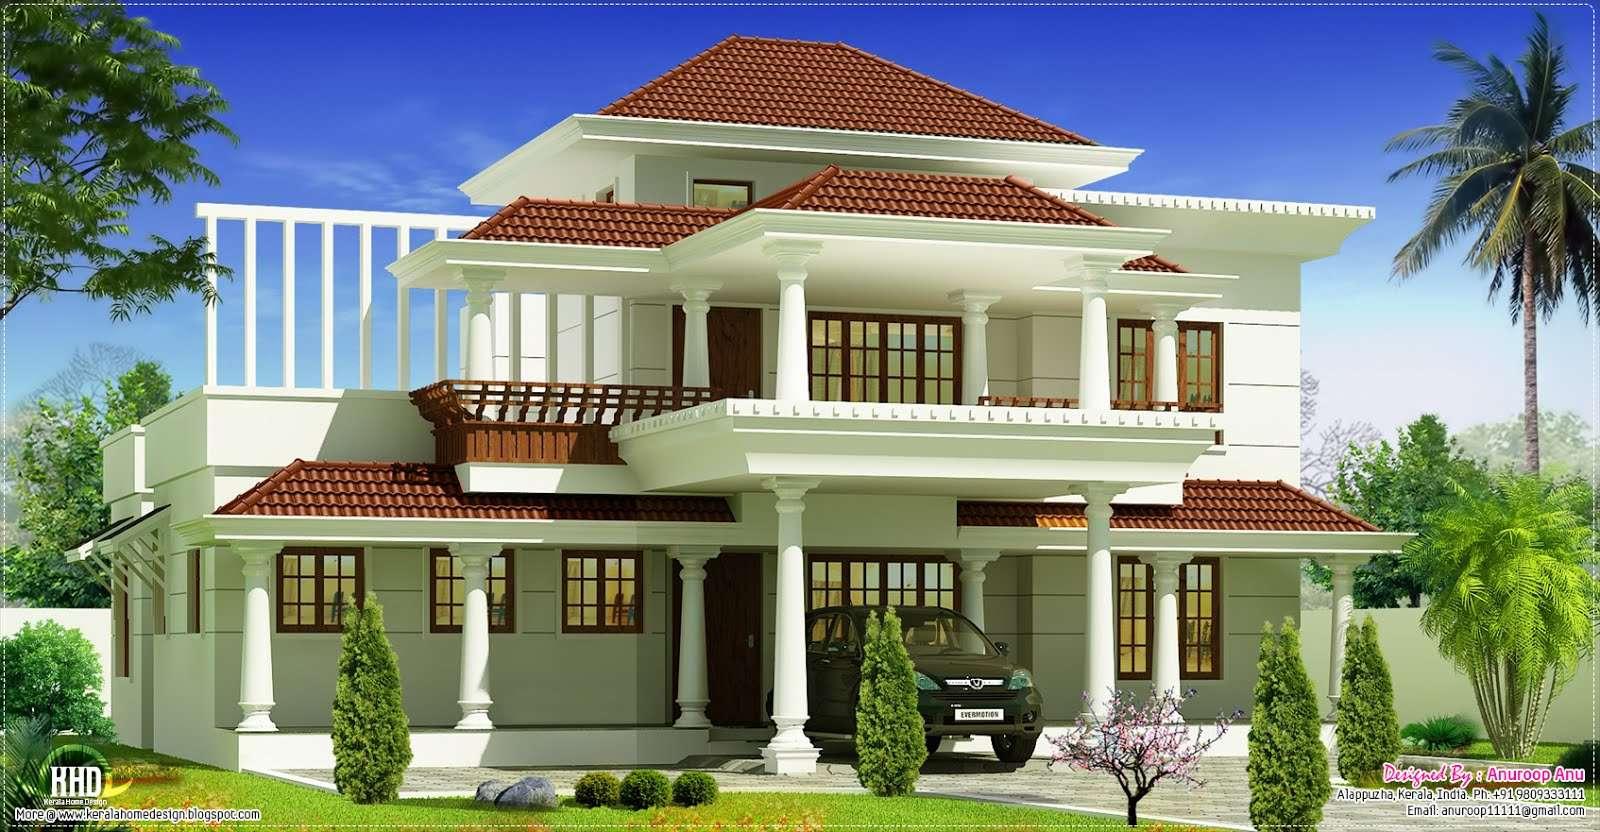 Kerala House Models Houses Plans Designs